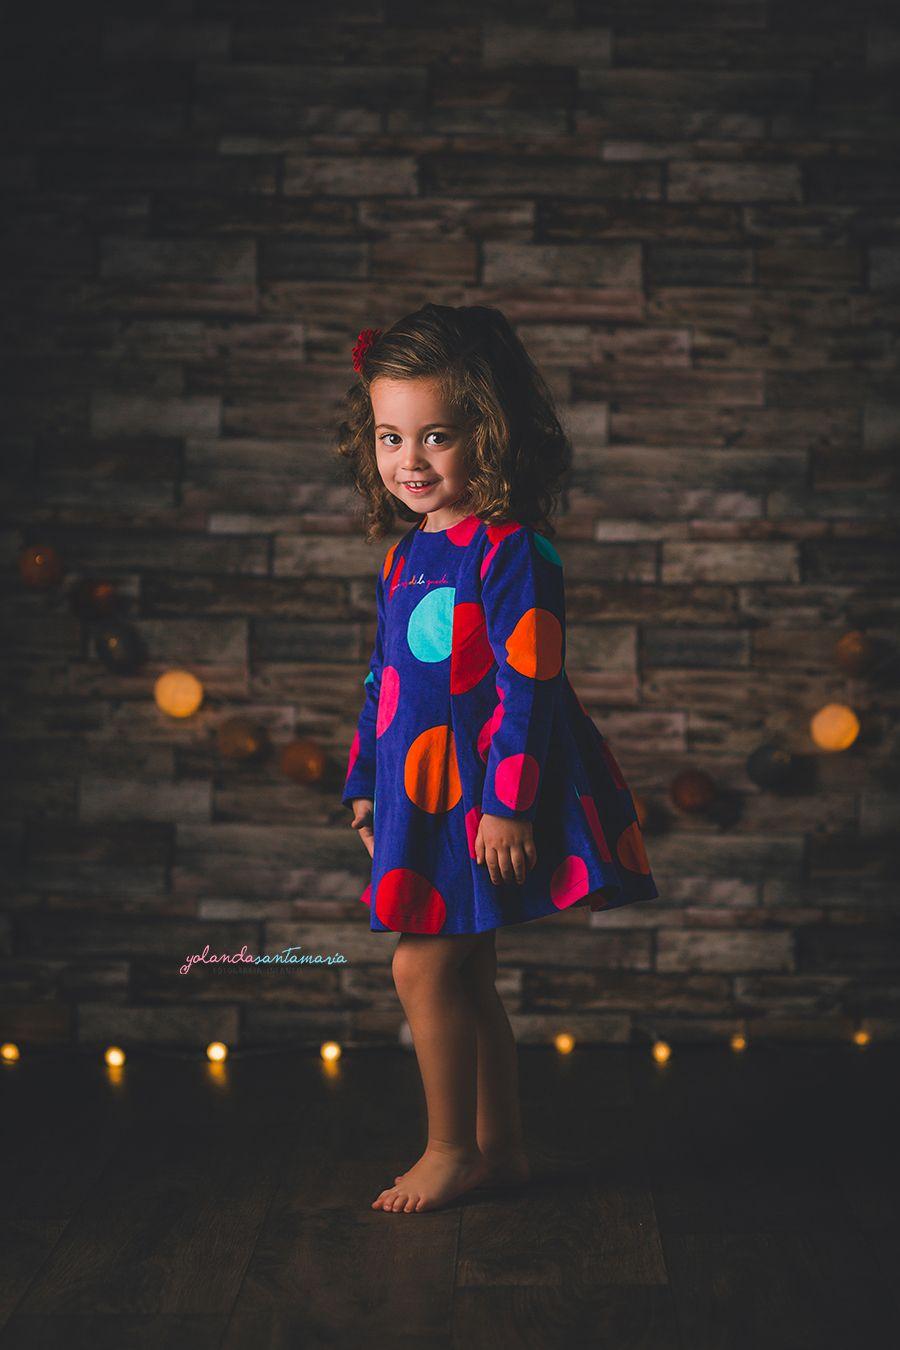 fotografo de Navidad